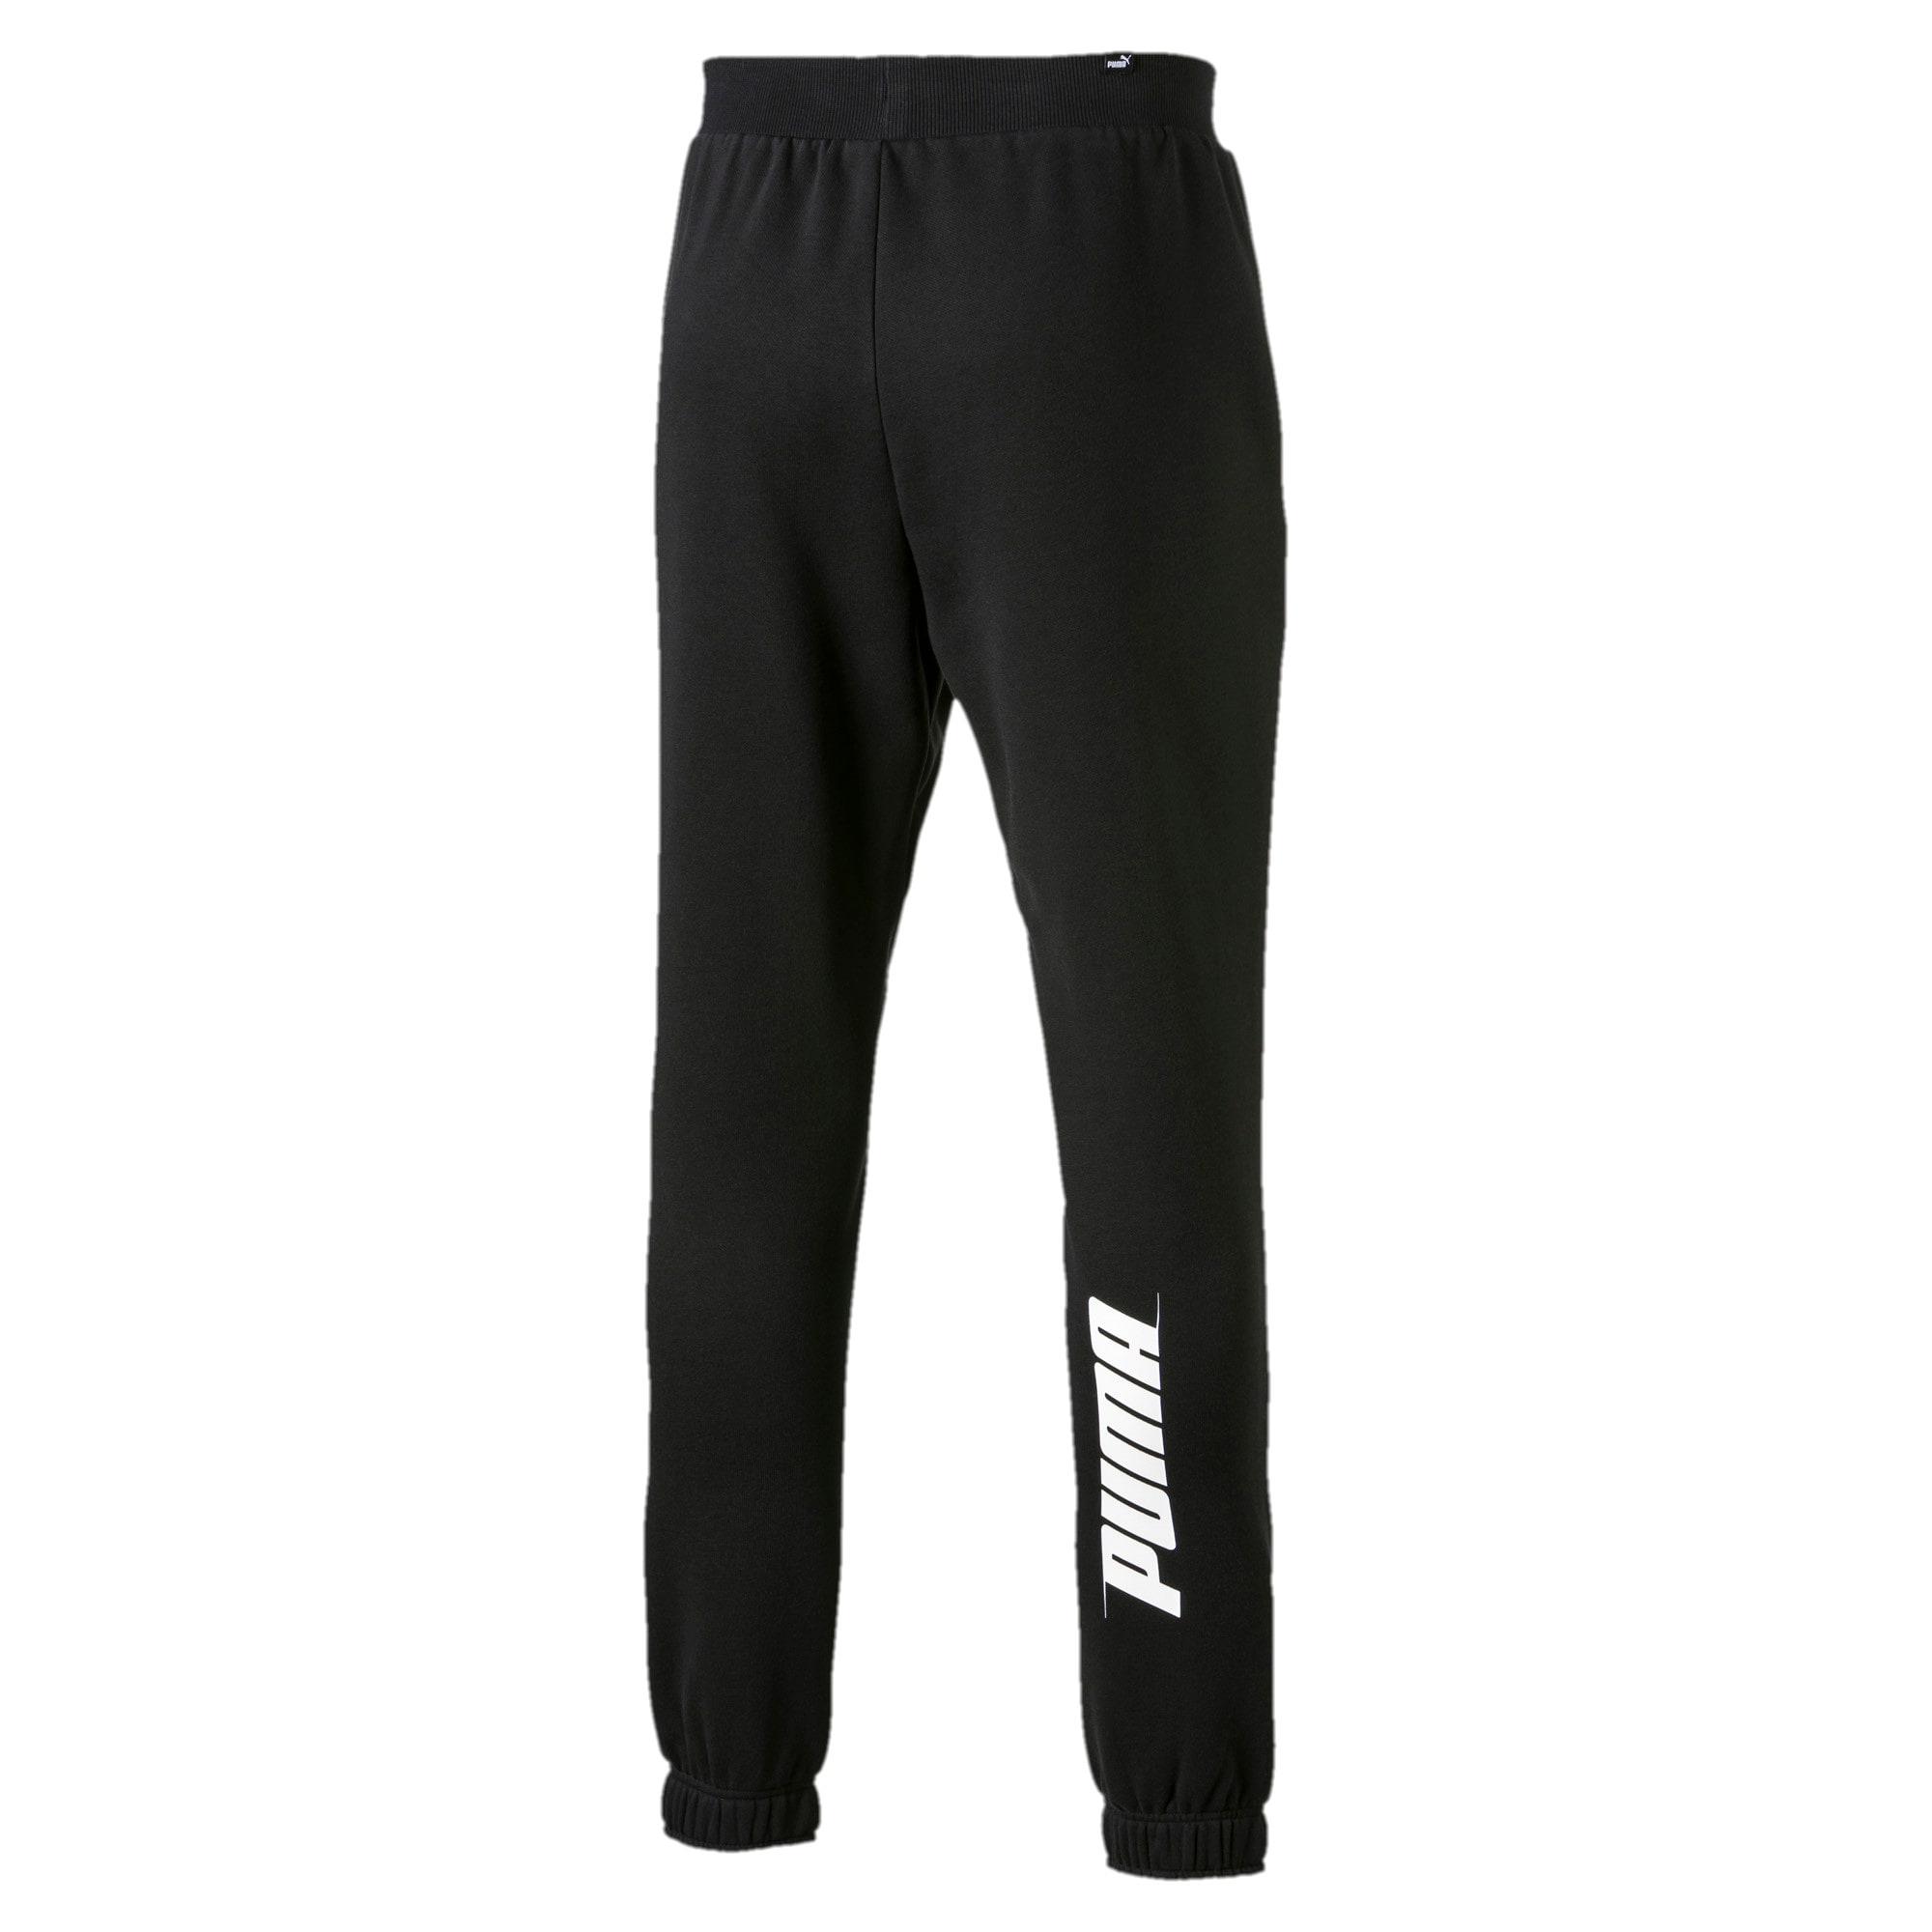 Thumbnail 4 of Rebel Bold Pants, Cotton Black, medium